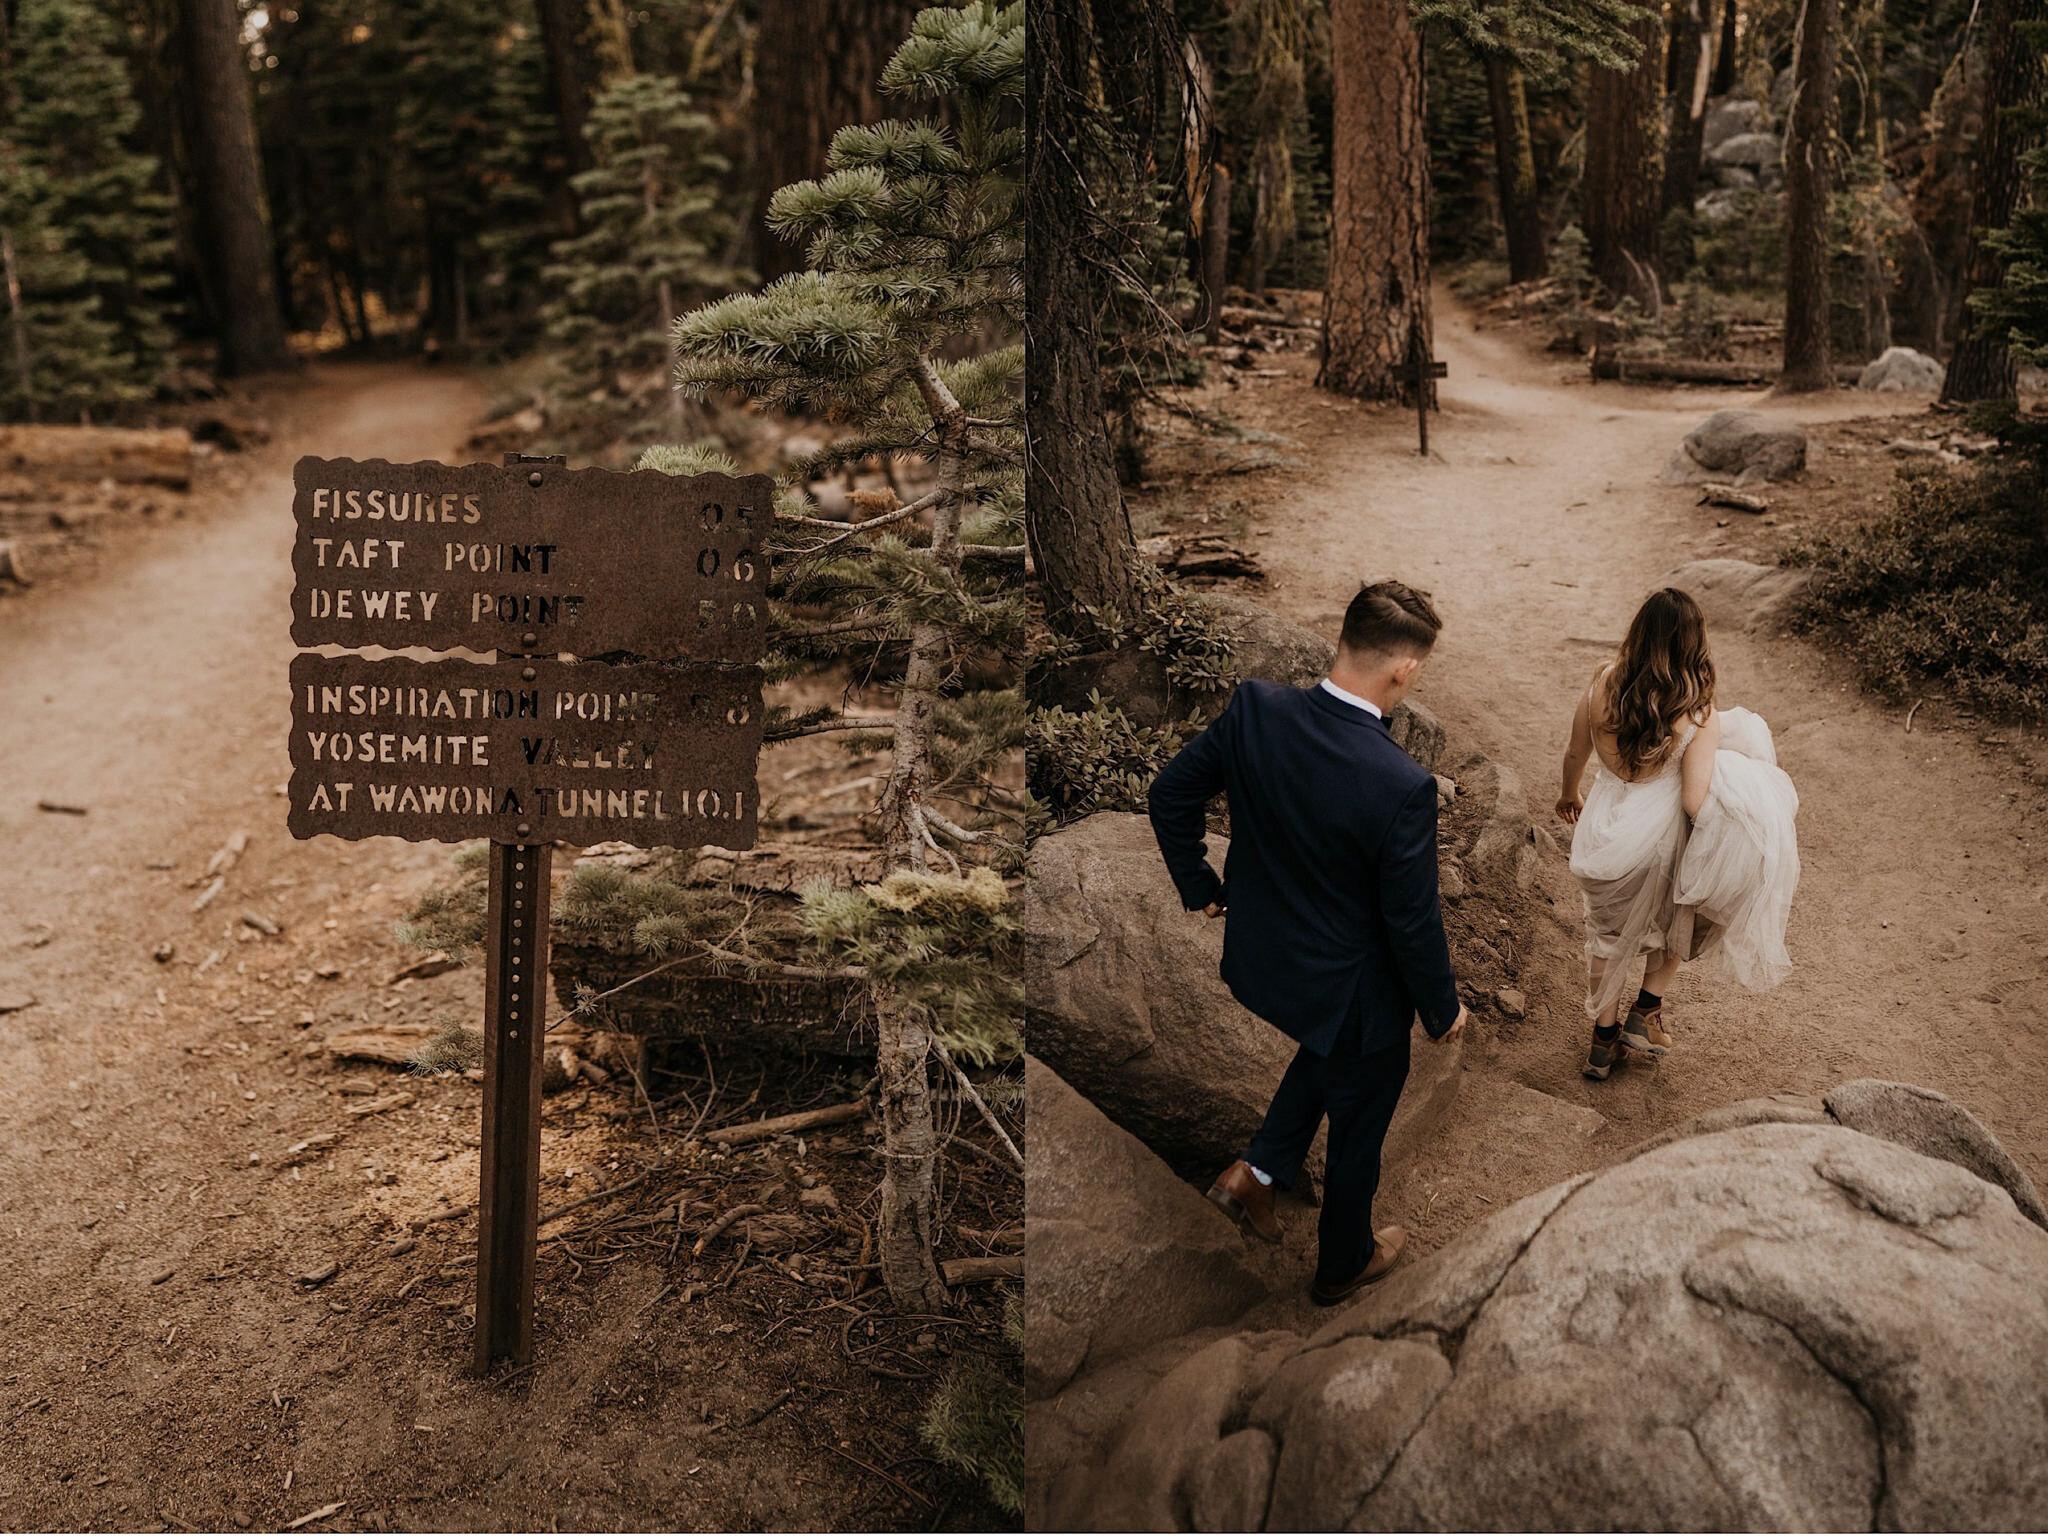 Yosemite-Adventure-Elopement-Taft-Glacier-Point-48.jpg